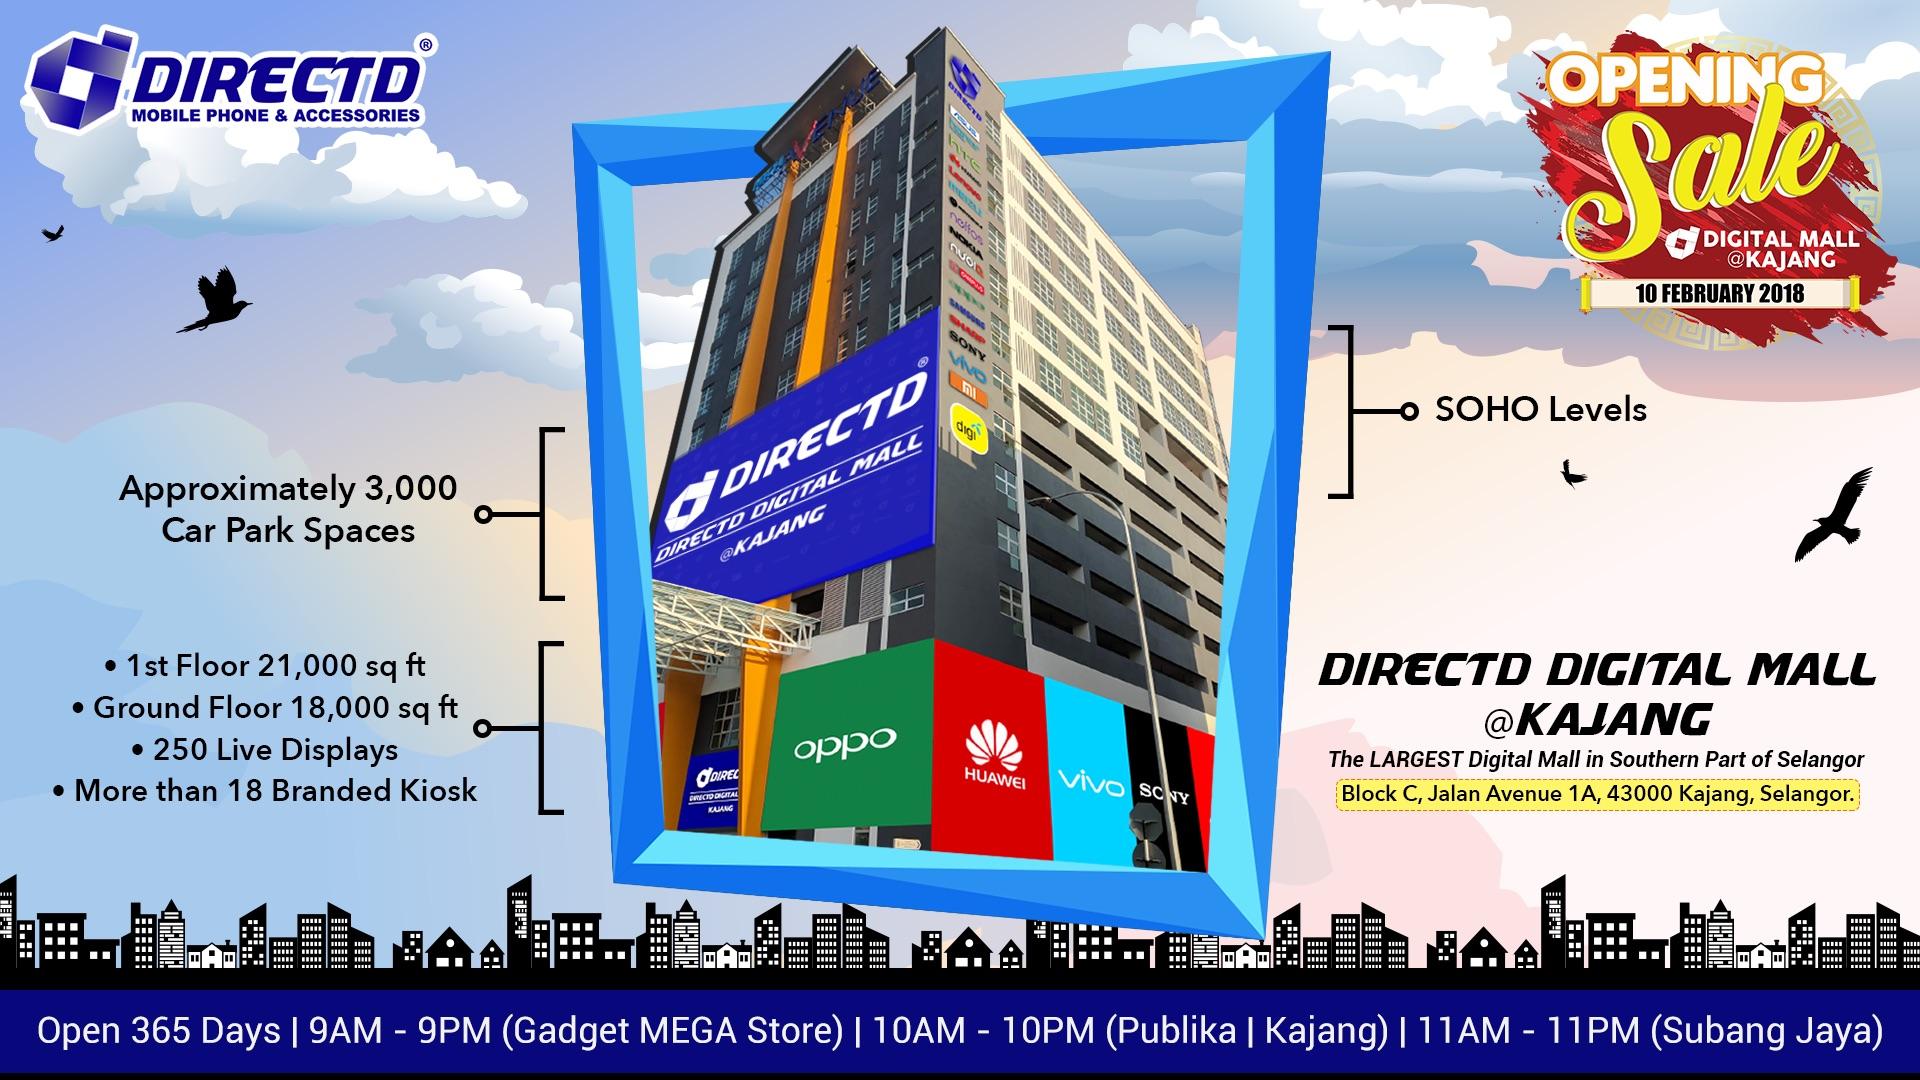 DirectD Opens Malaysia's Largest Digital Hub in Kajang